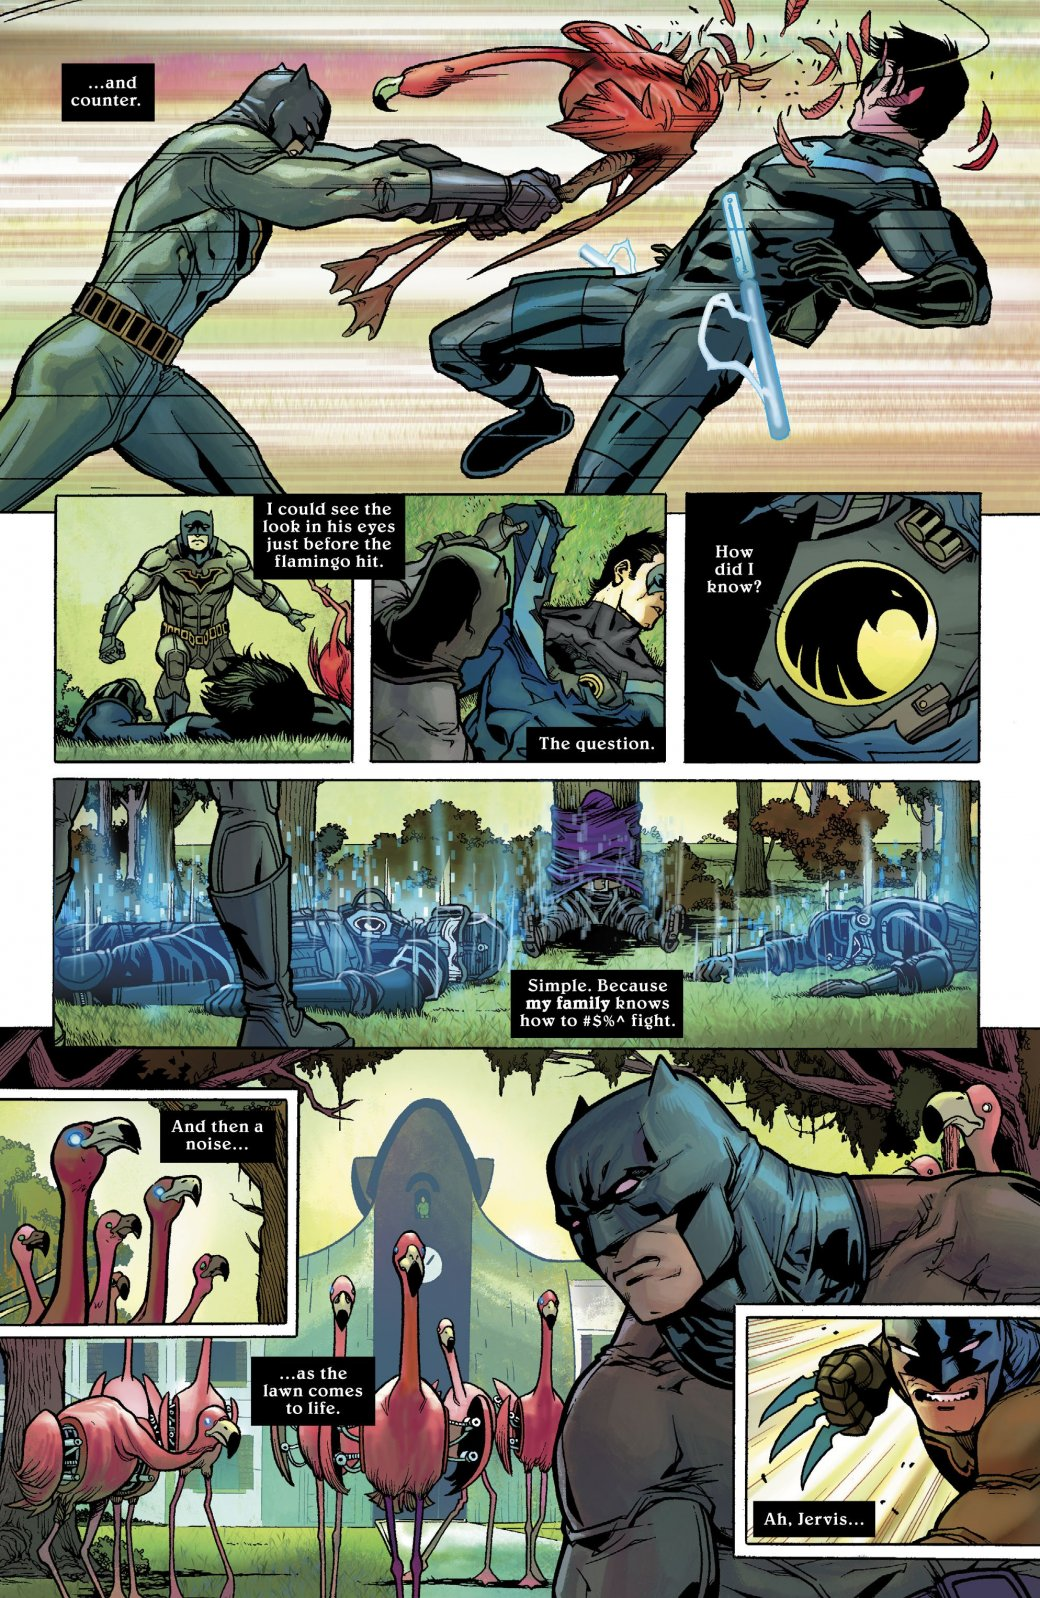 Бэтмен против Безумного Шляпника - Изображение 1